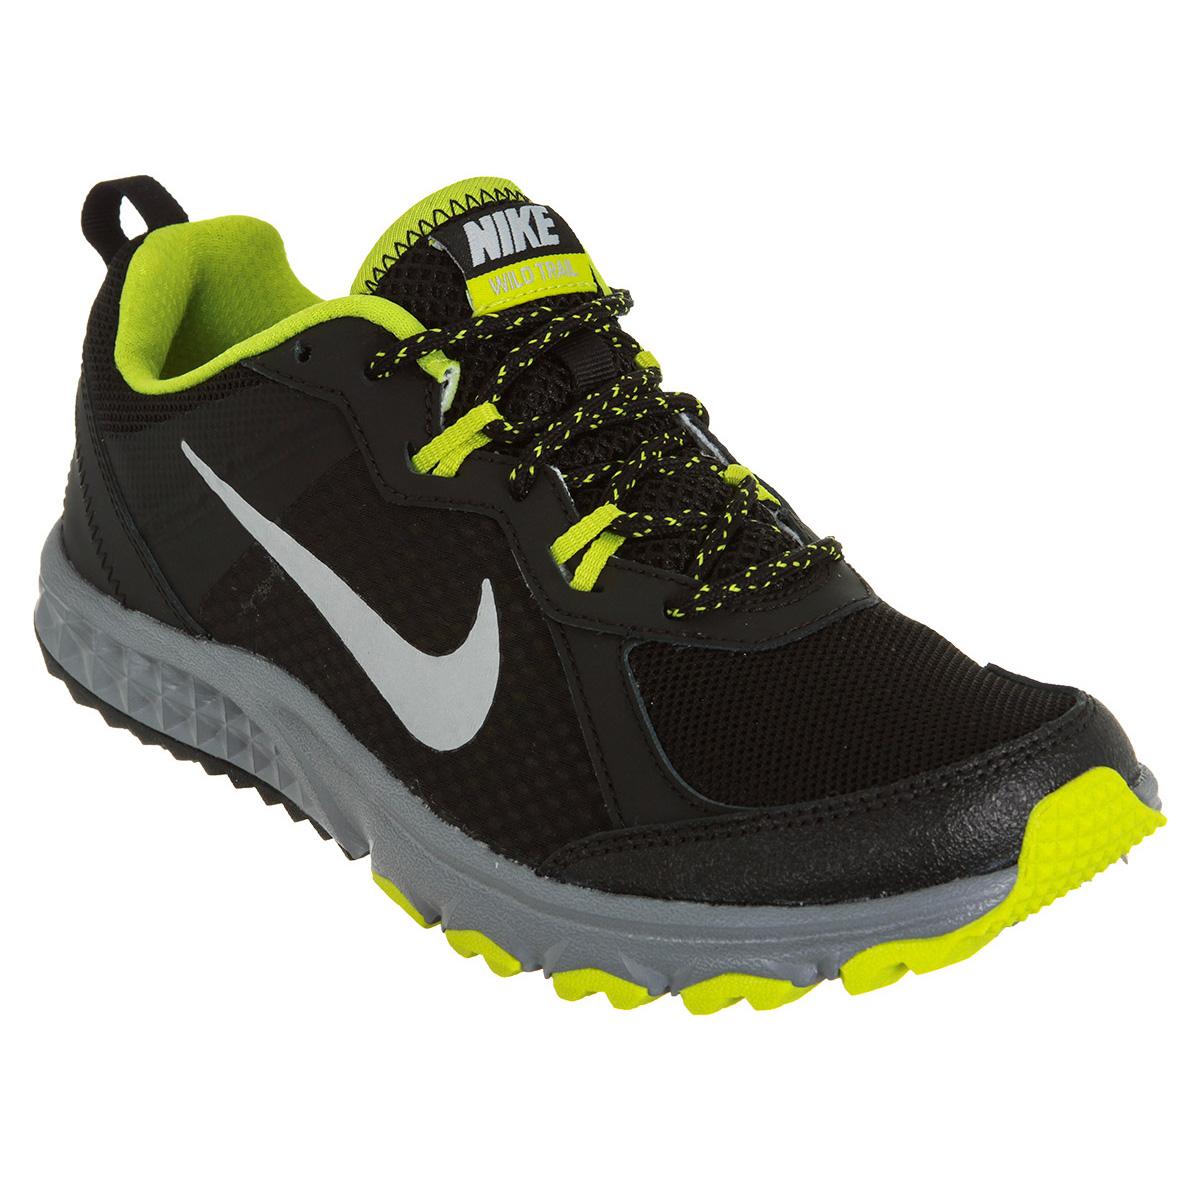 Nike Wild Trail - Hombre - Negro